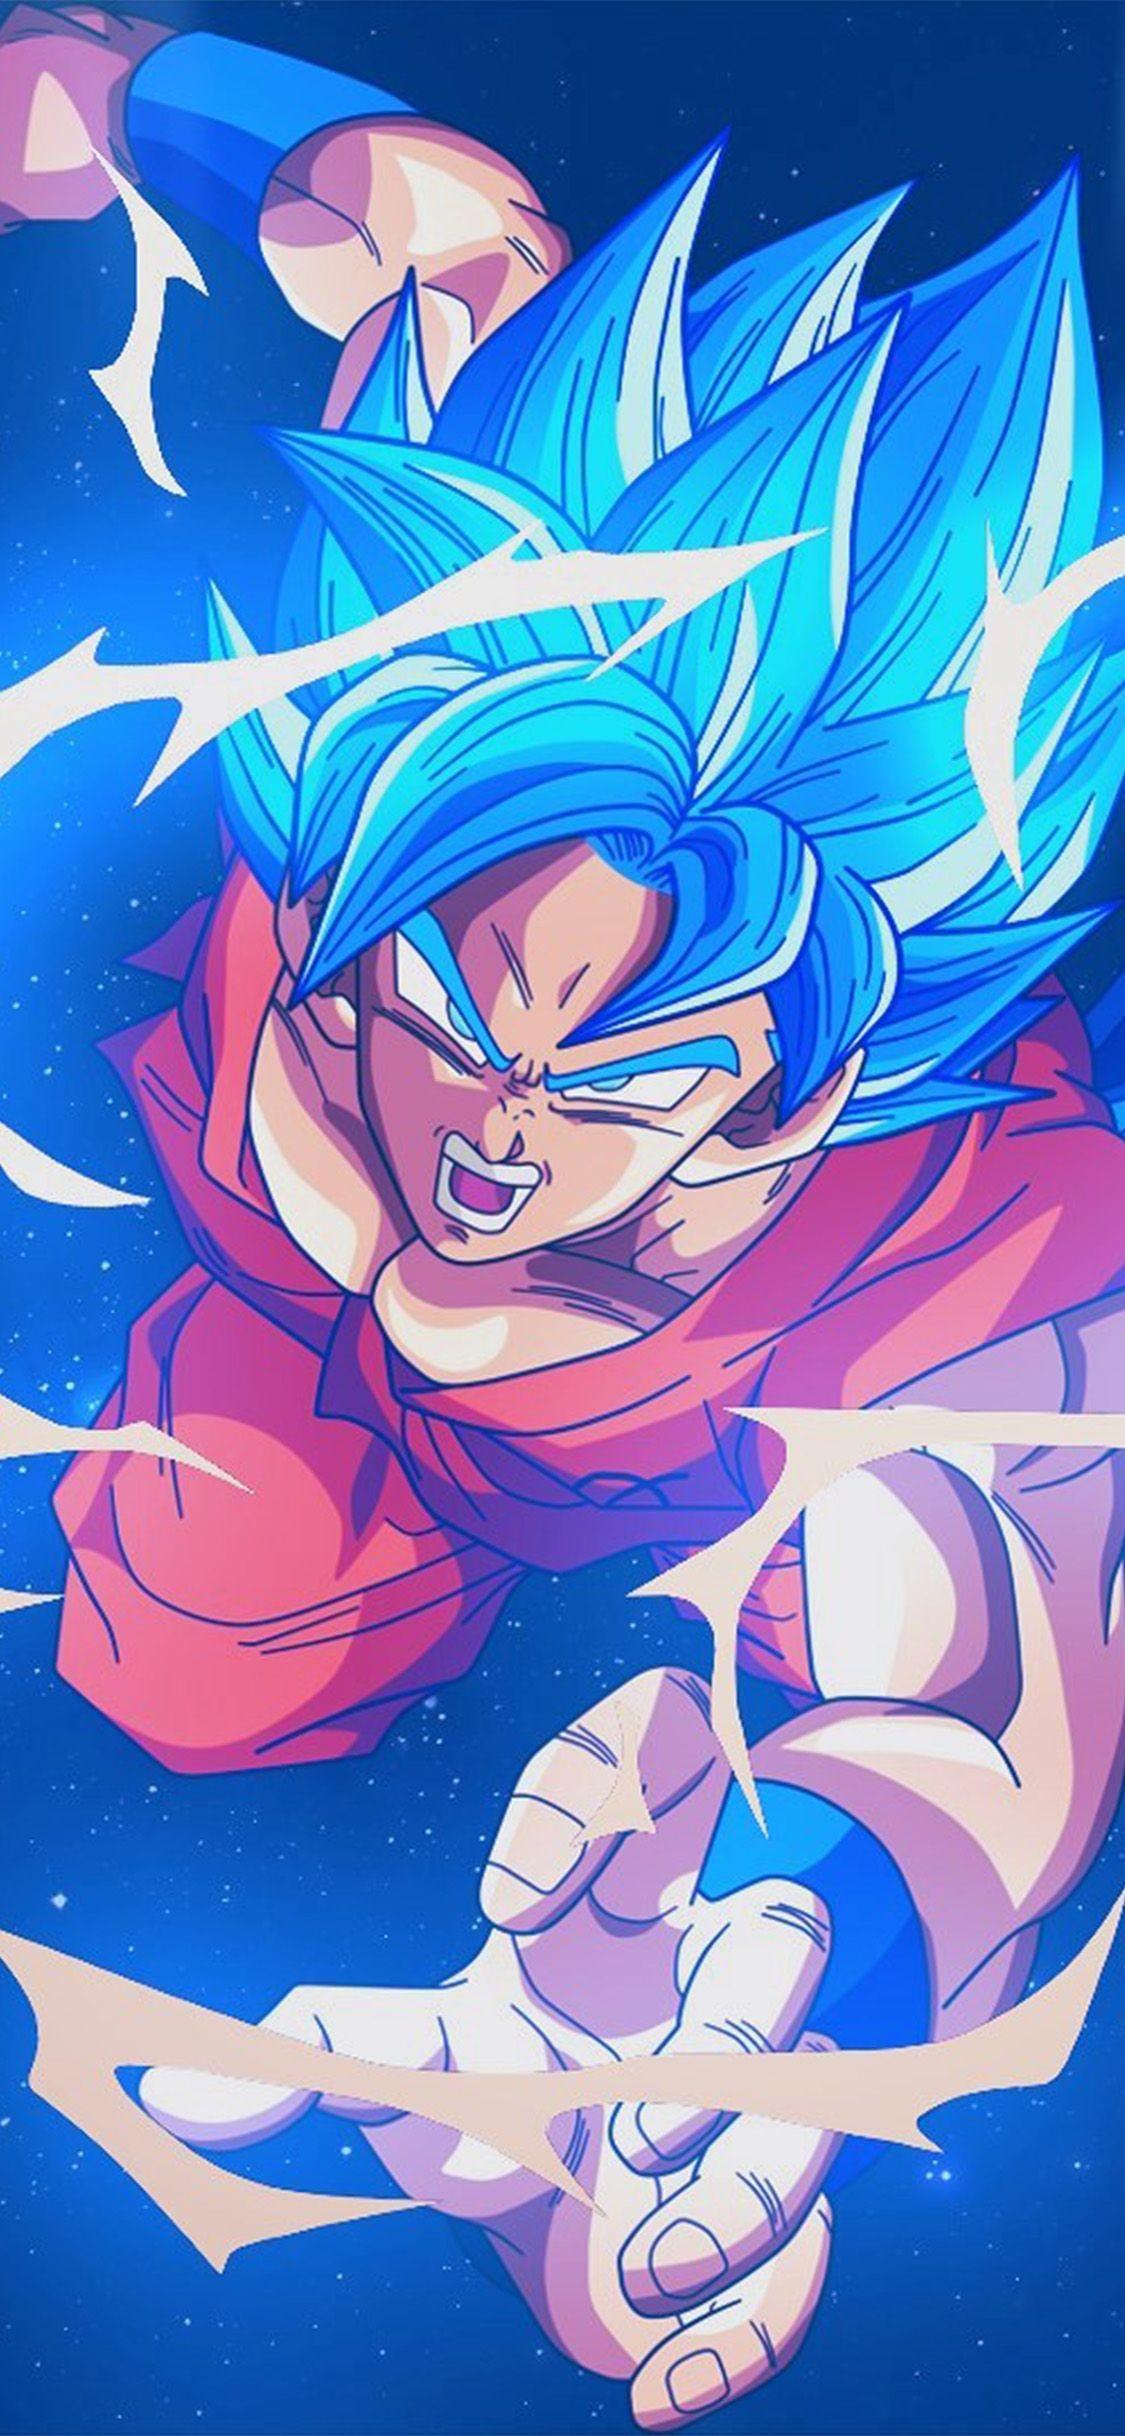 77 Goku Iphone Wallpapers on WallpaperPlay 1125x2436